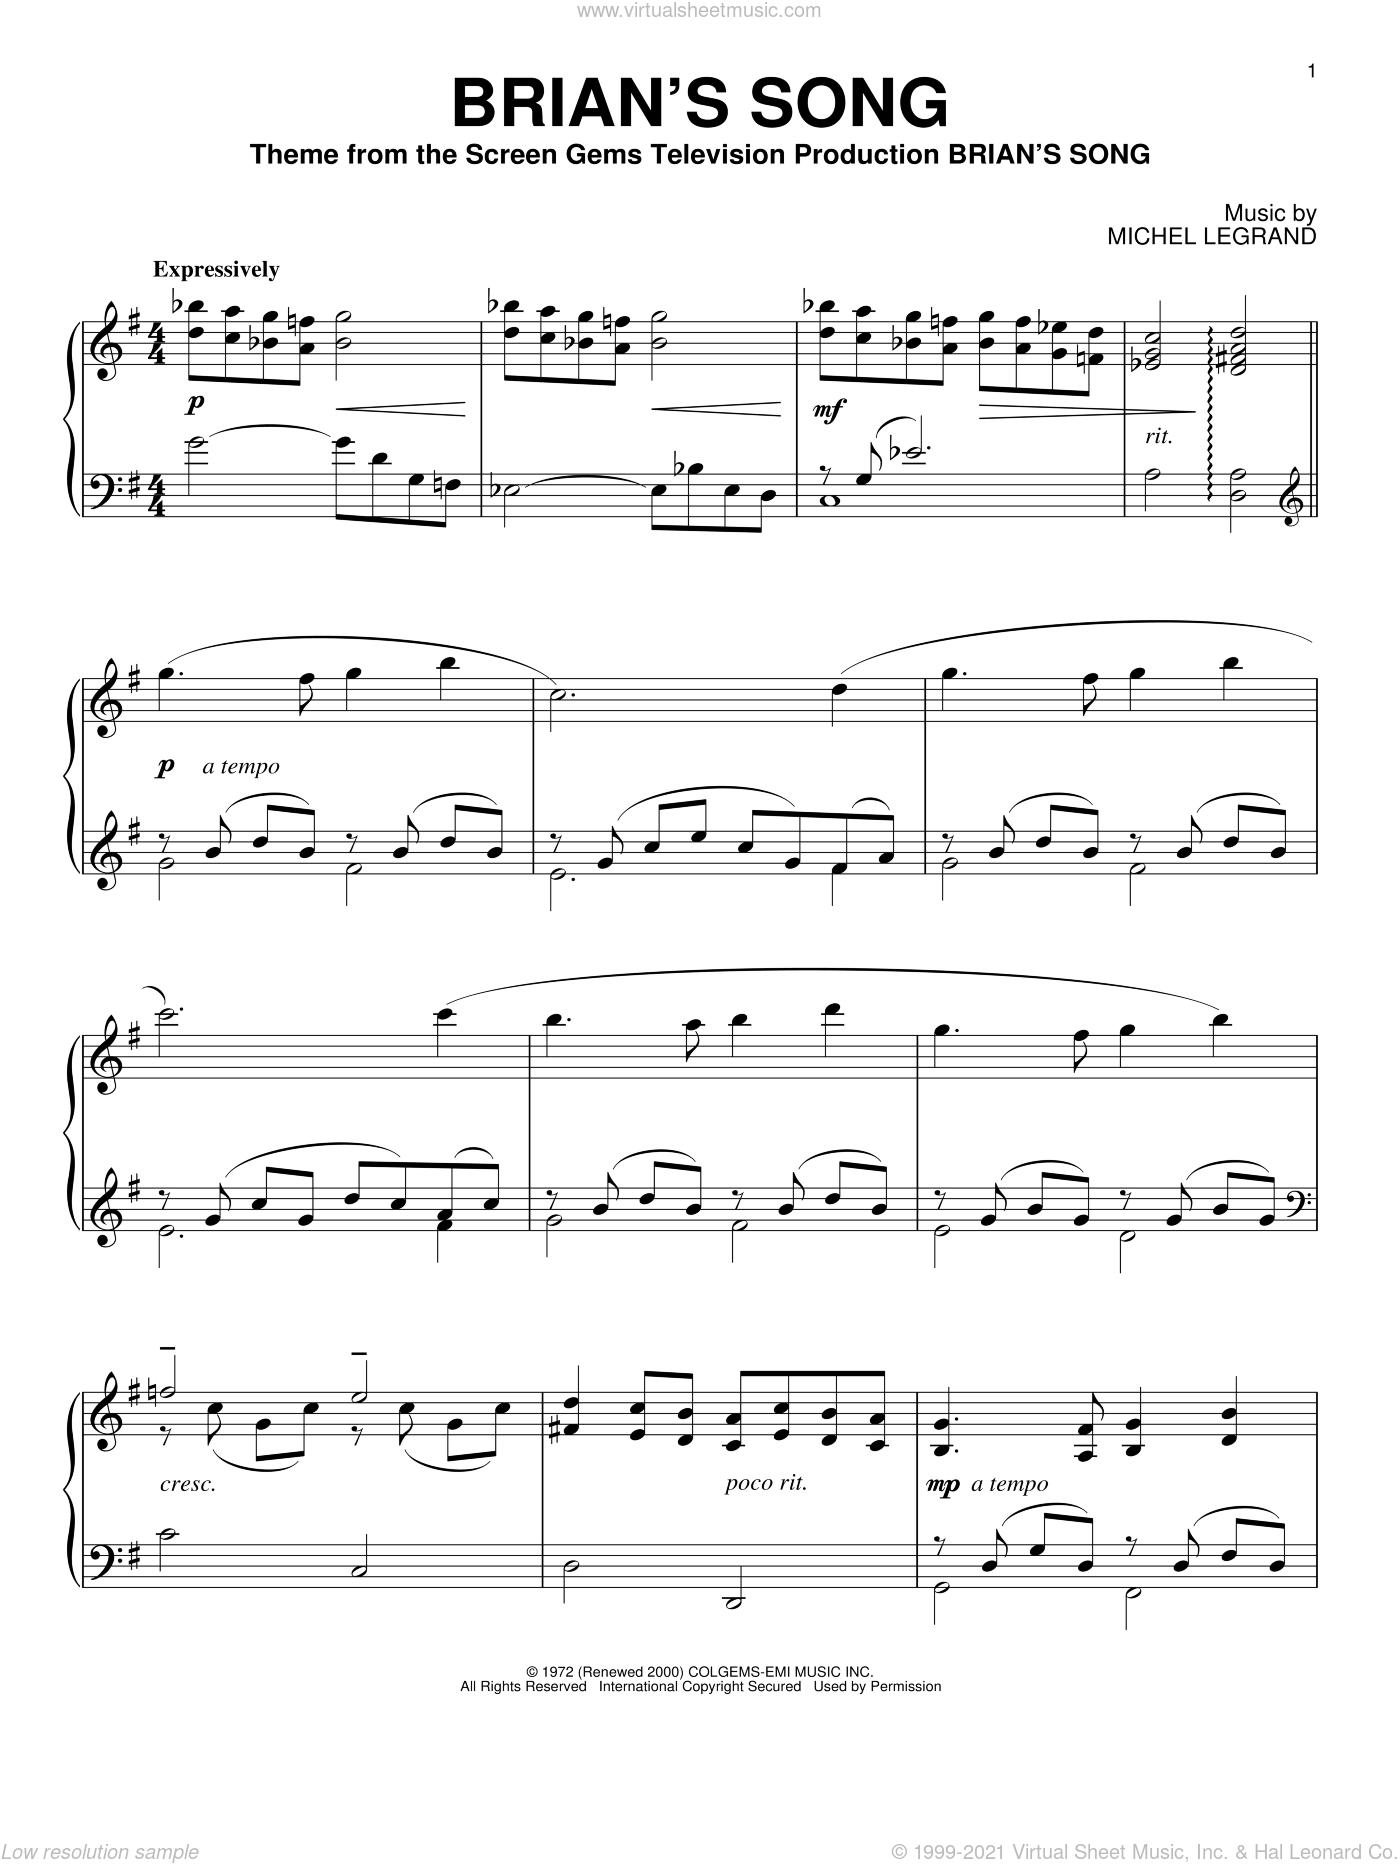 Brian's Song sheet music for piano solo by Michel LeGrand, intermediate skill level